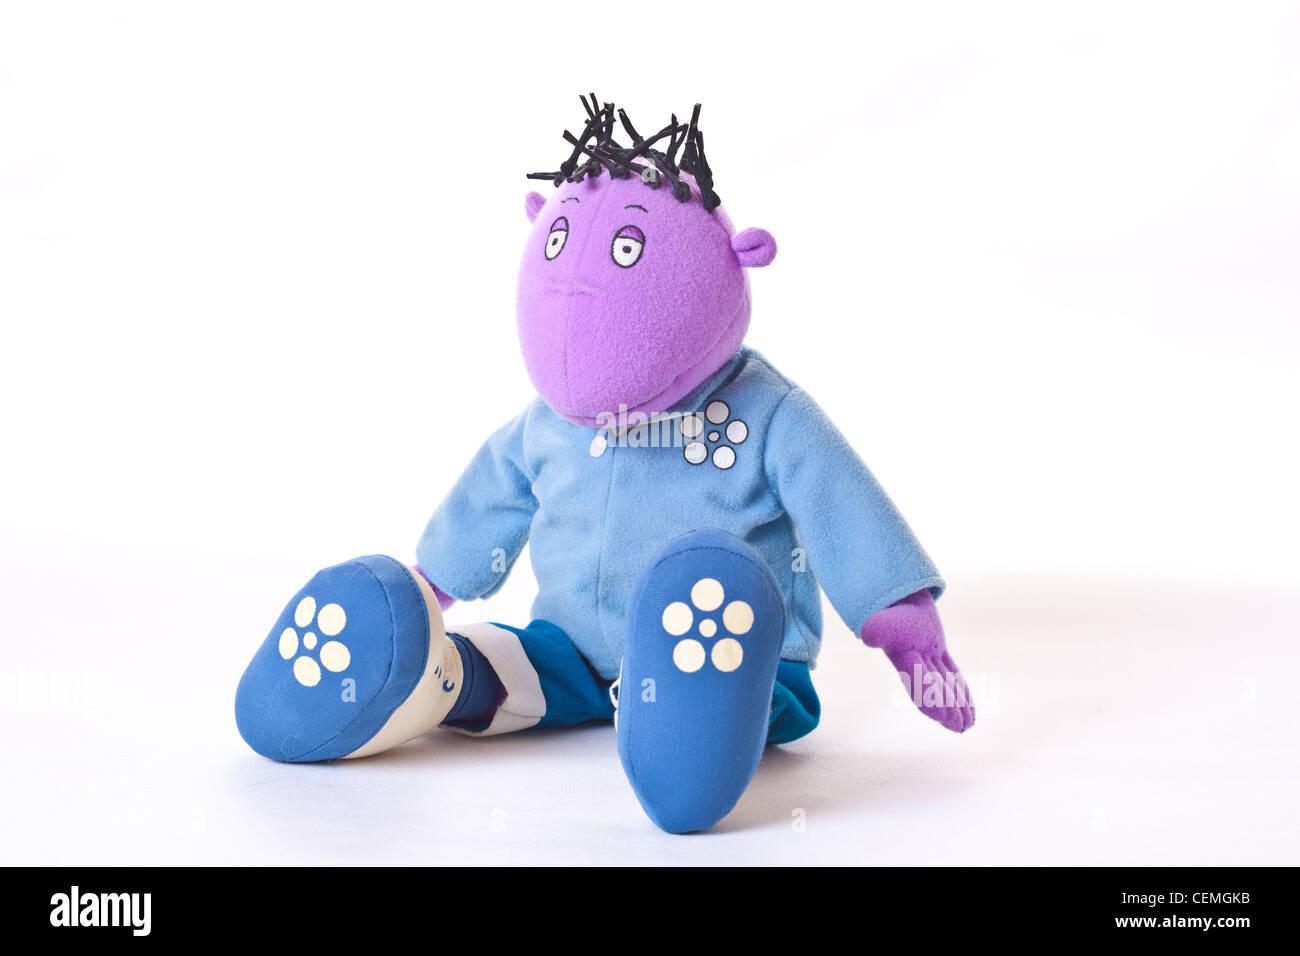 milo from the tweenies tv childrens show, cuddly toy, toy milo, milo the toy, milo the childrens toy - Stock Image